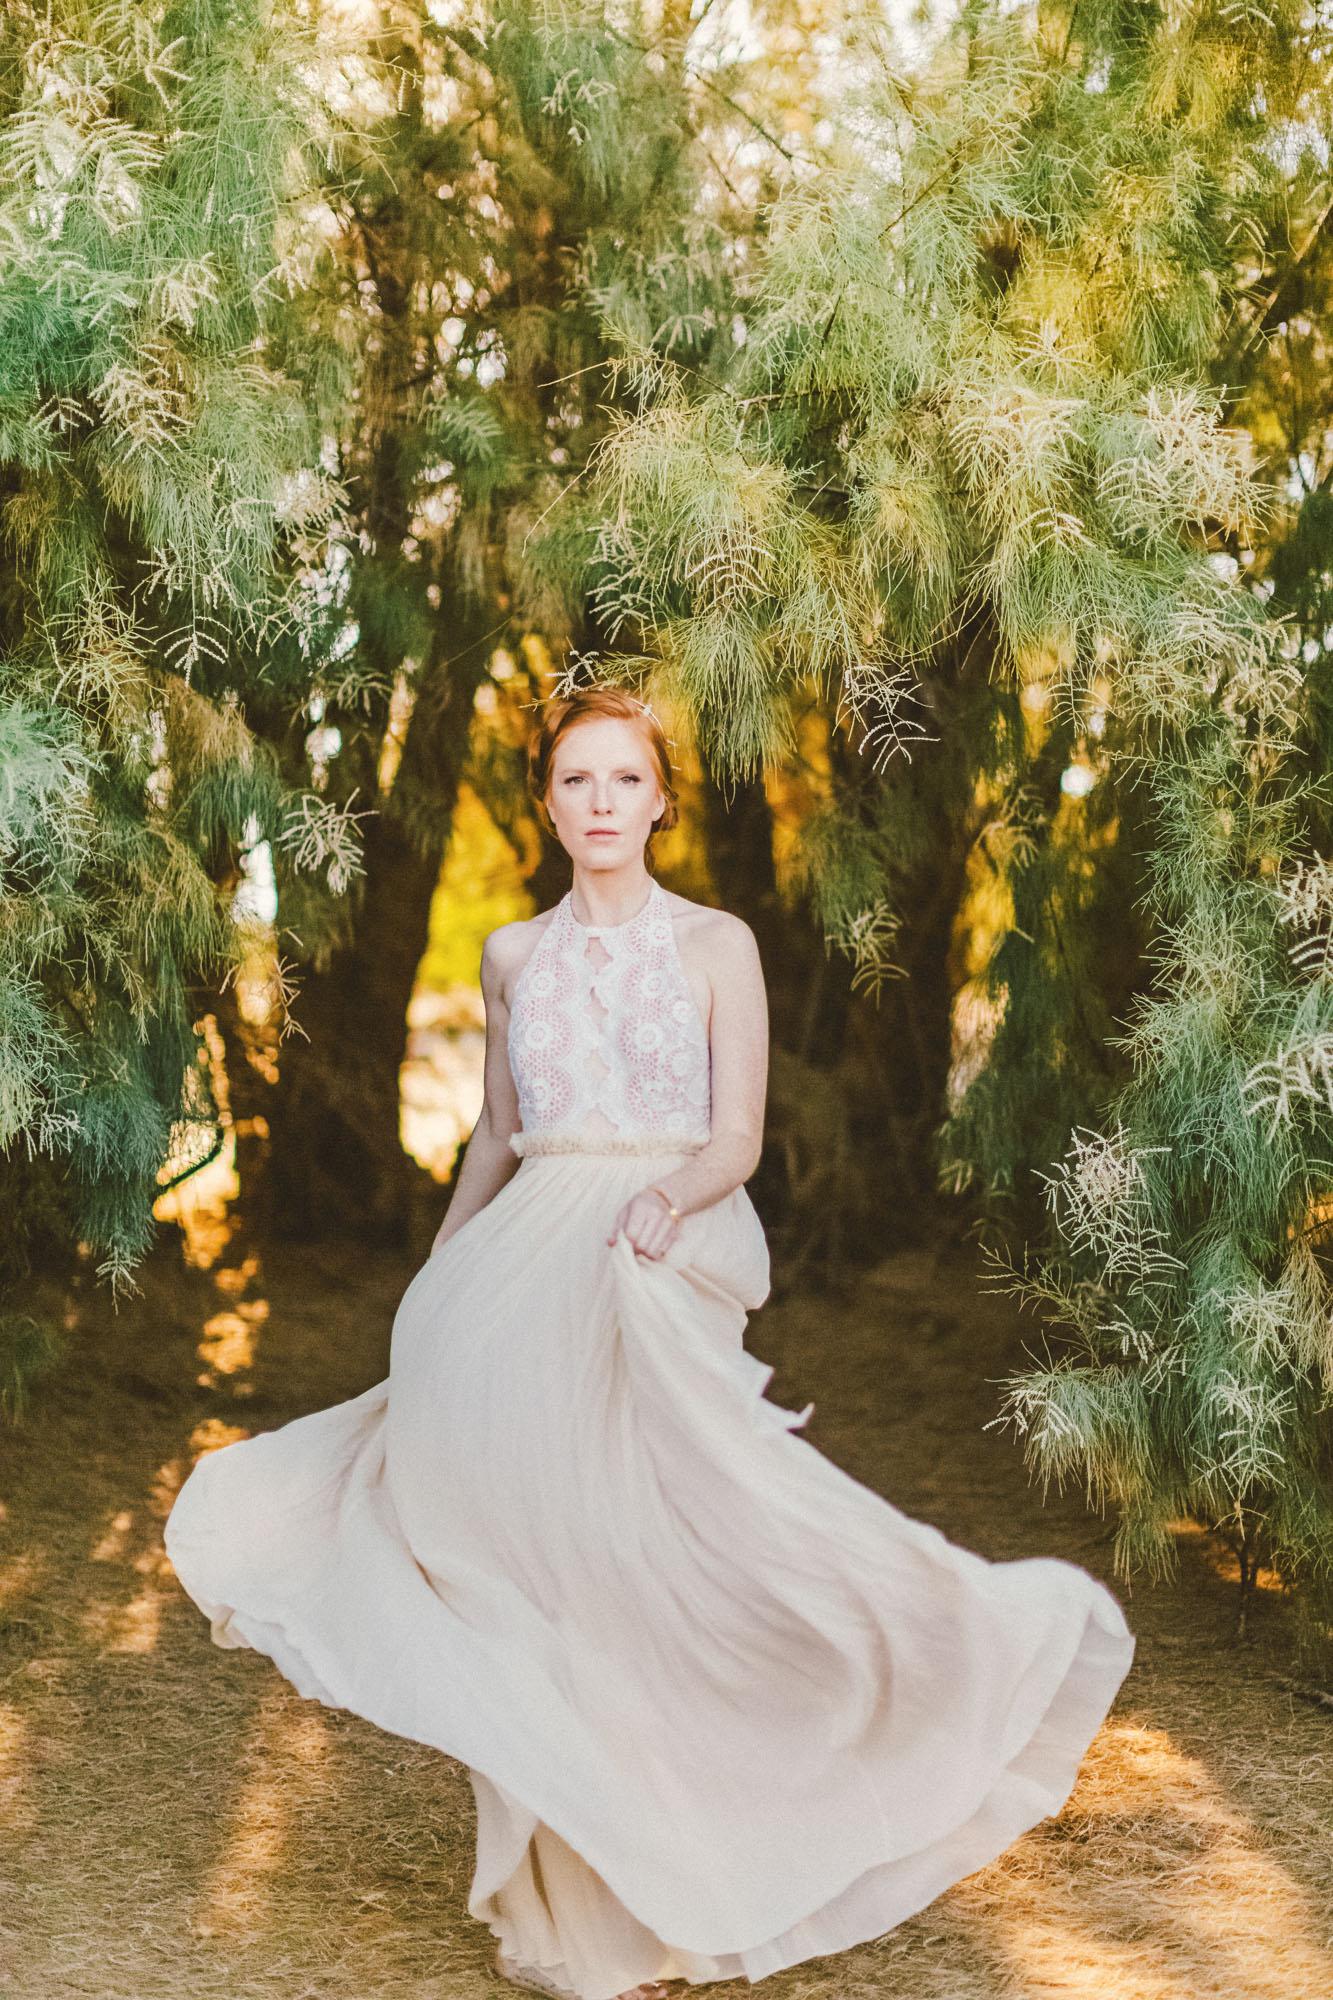 Luxe Bride Maui wedding photographer